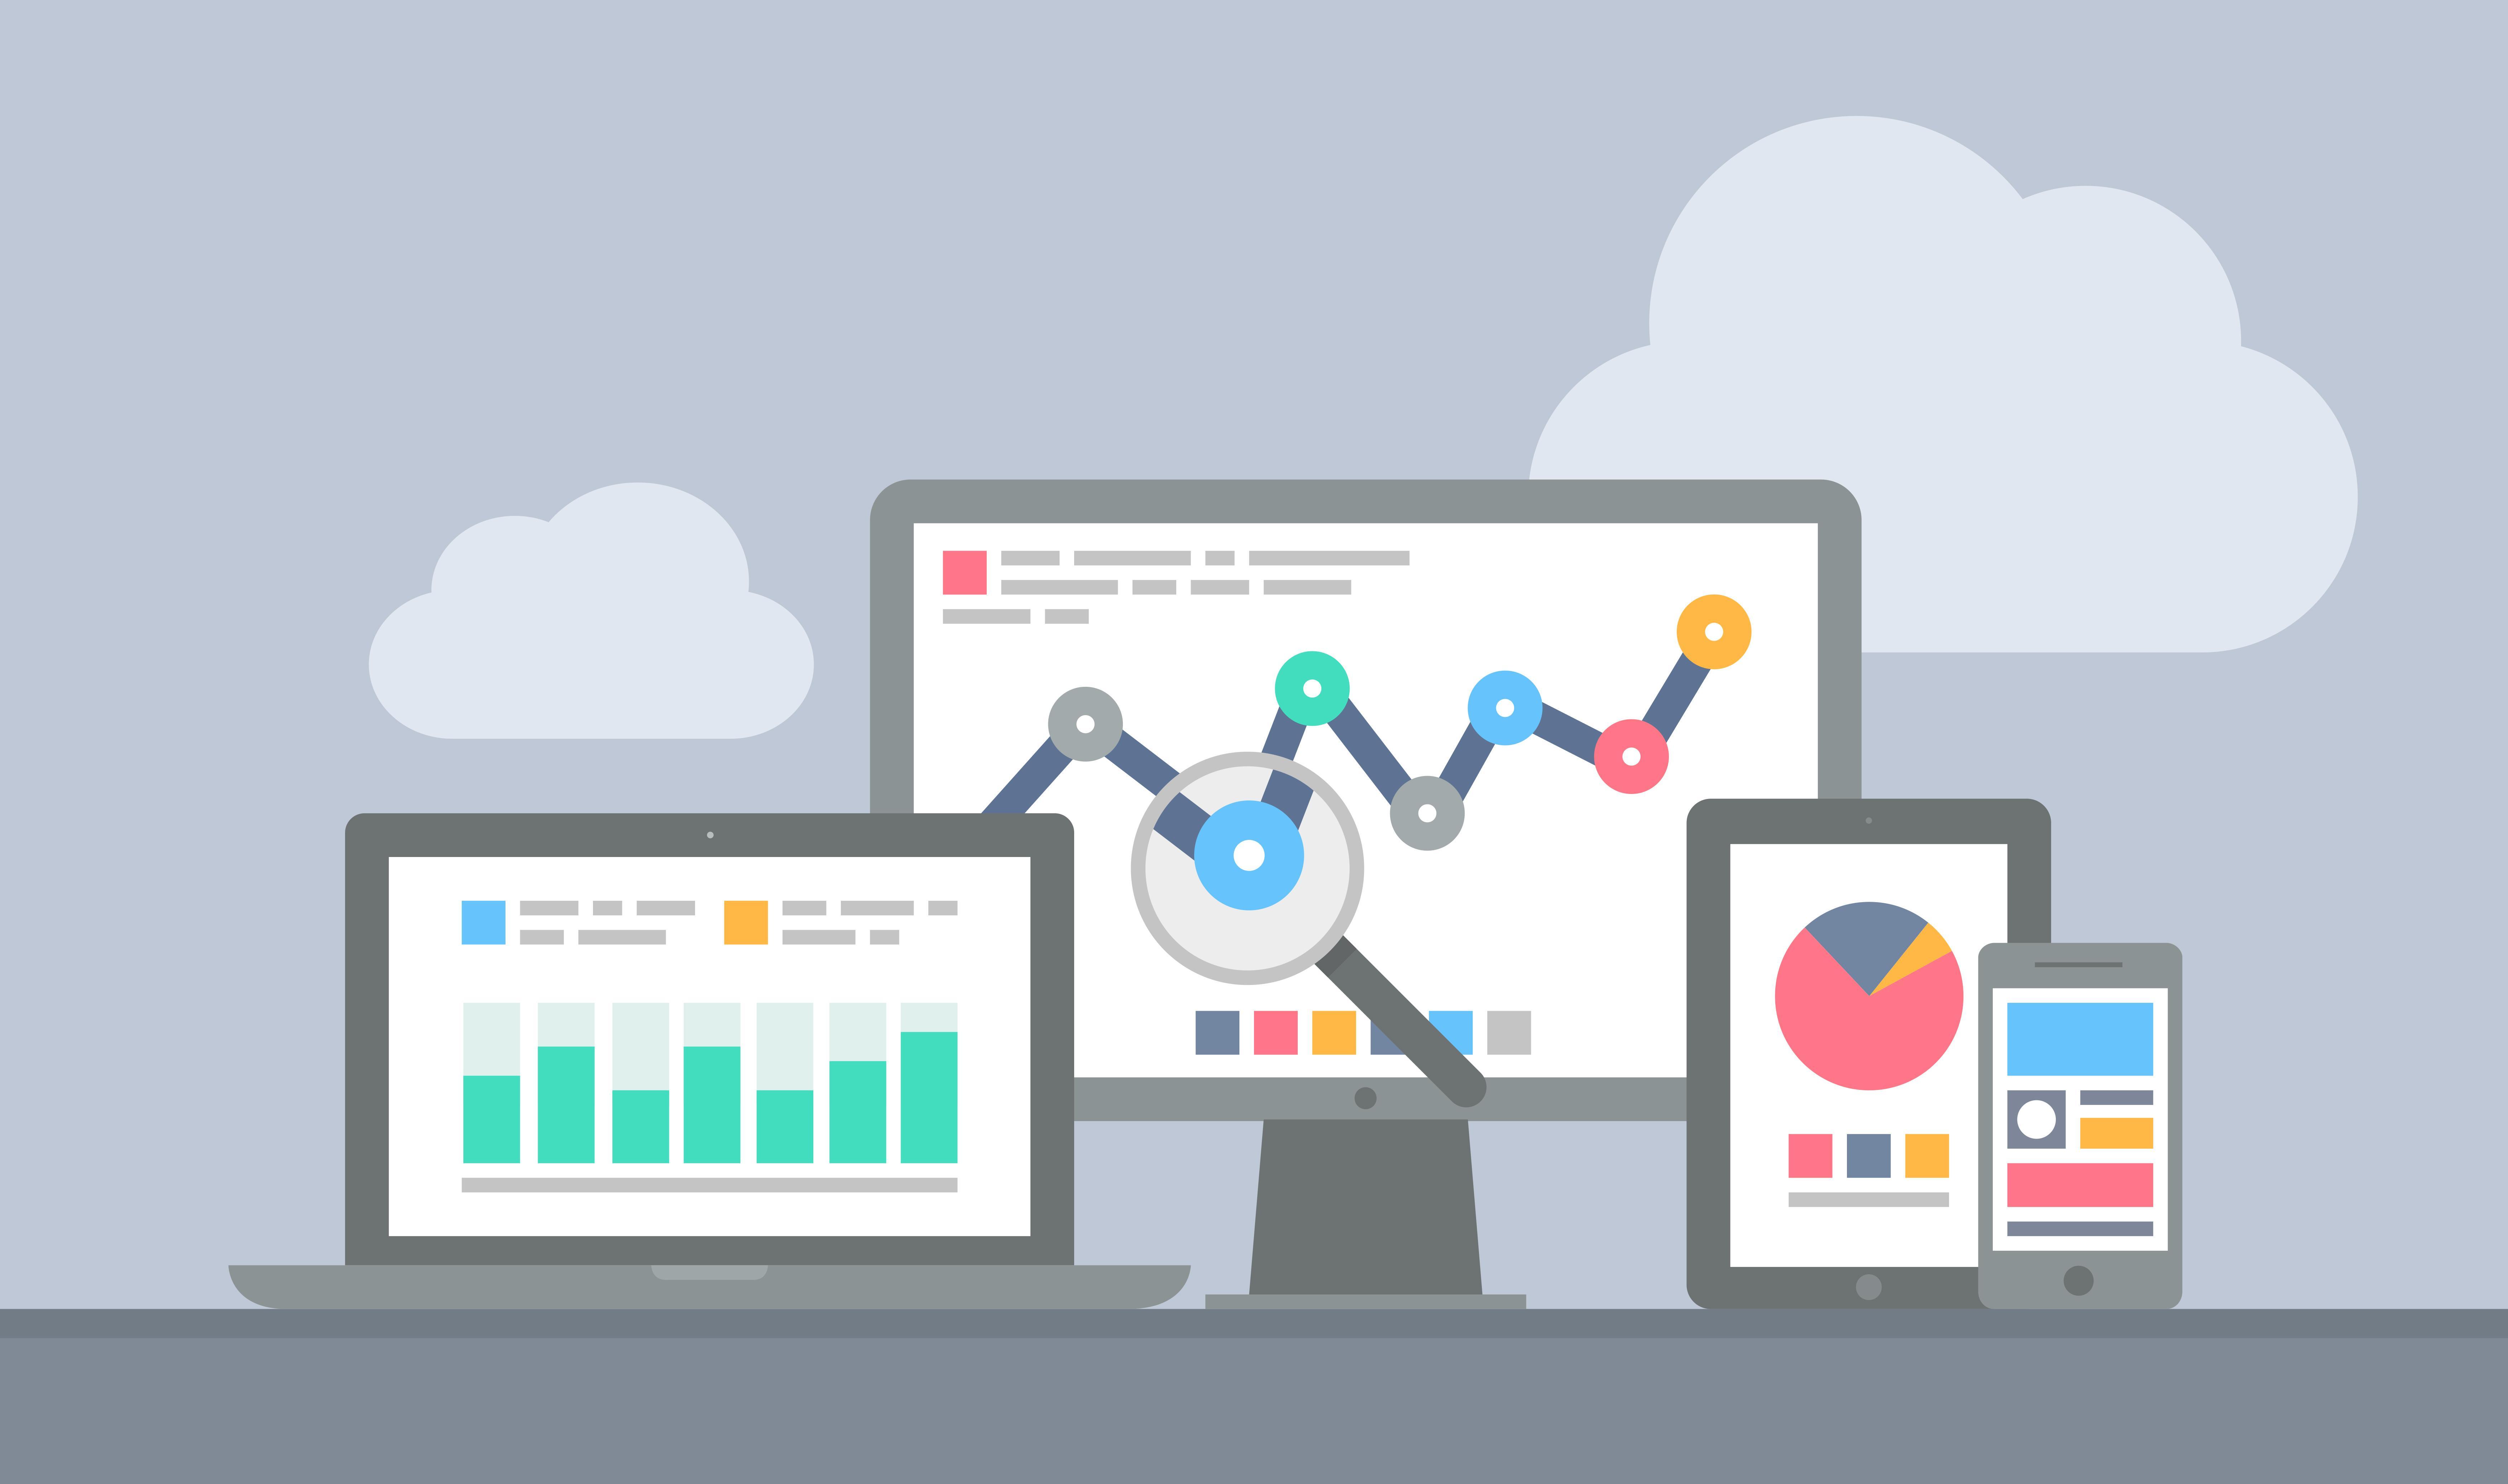 Tableau Software : logiciel de bi (business intelligence), reporting - Avis et prix